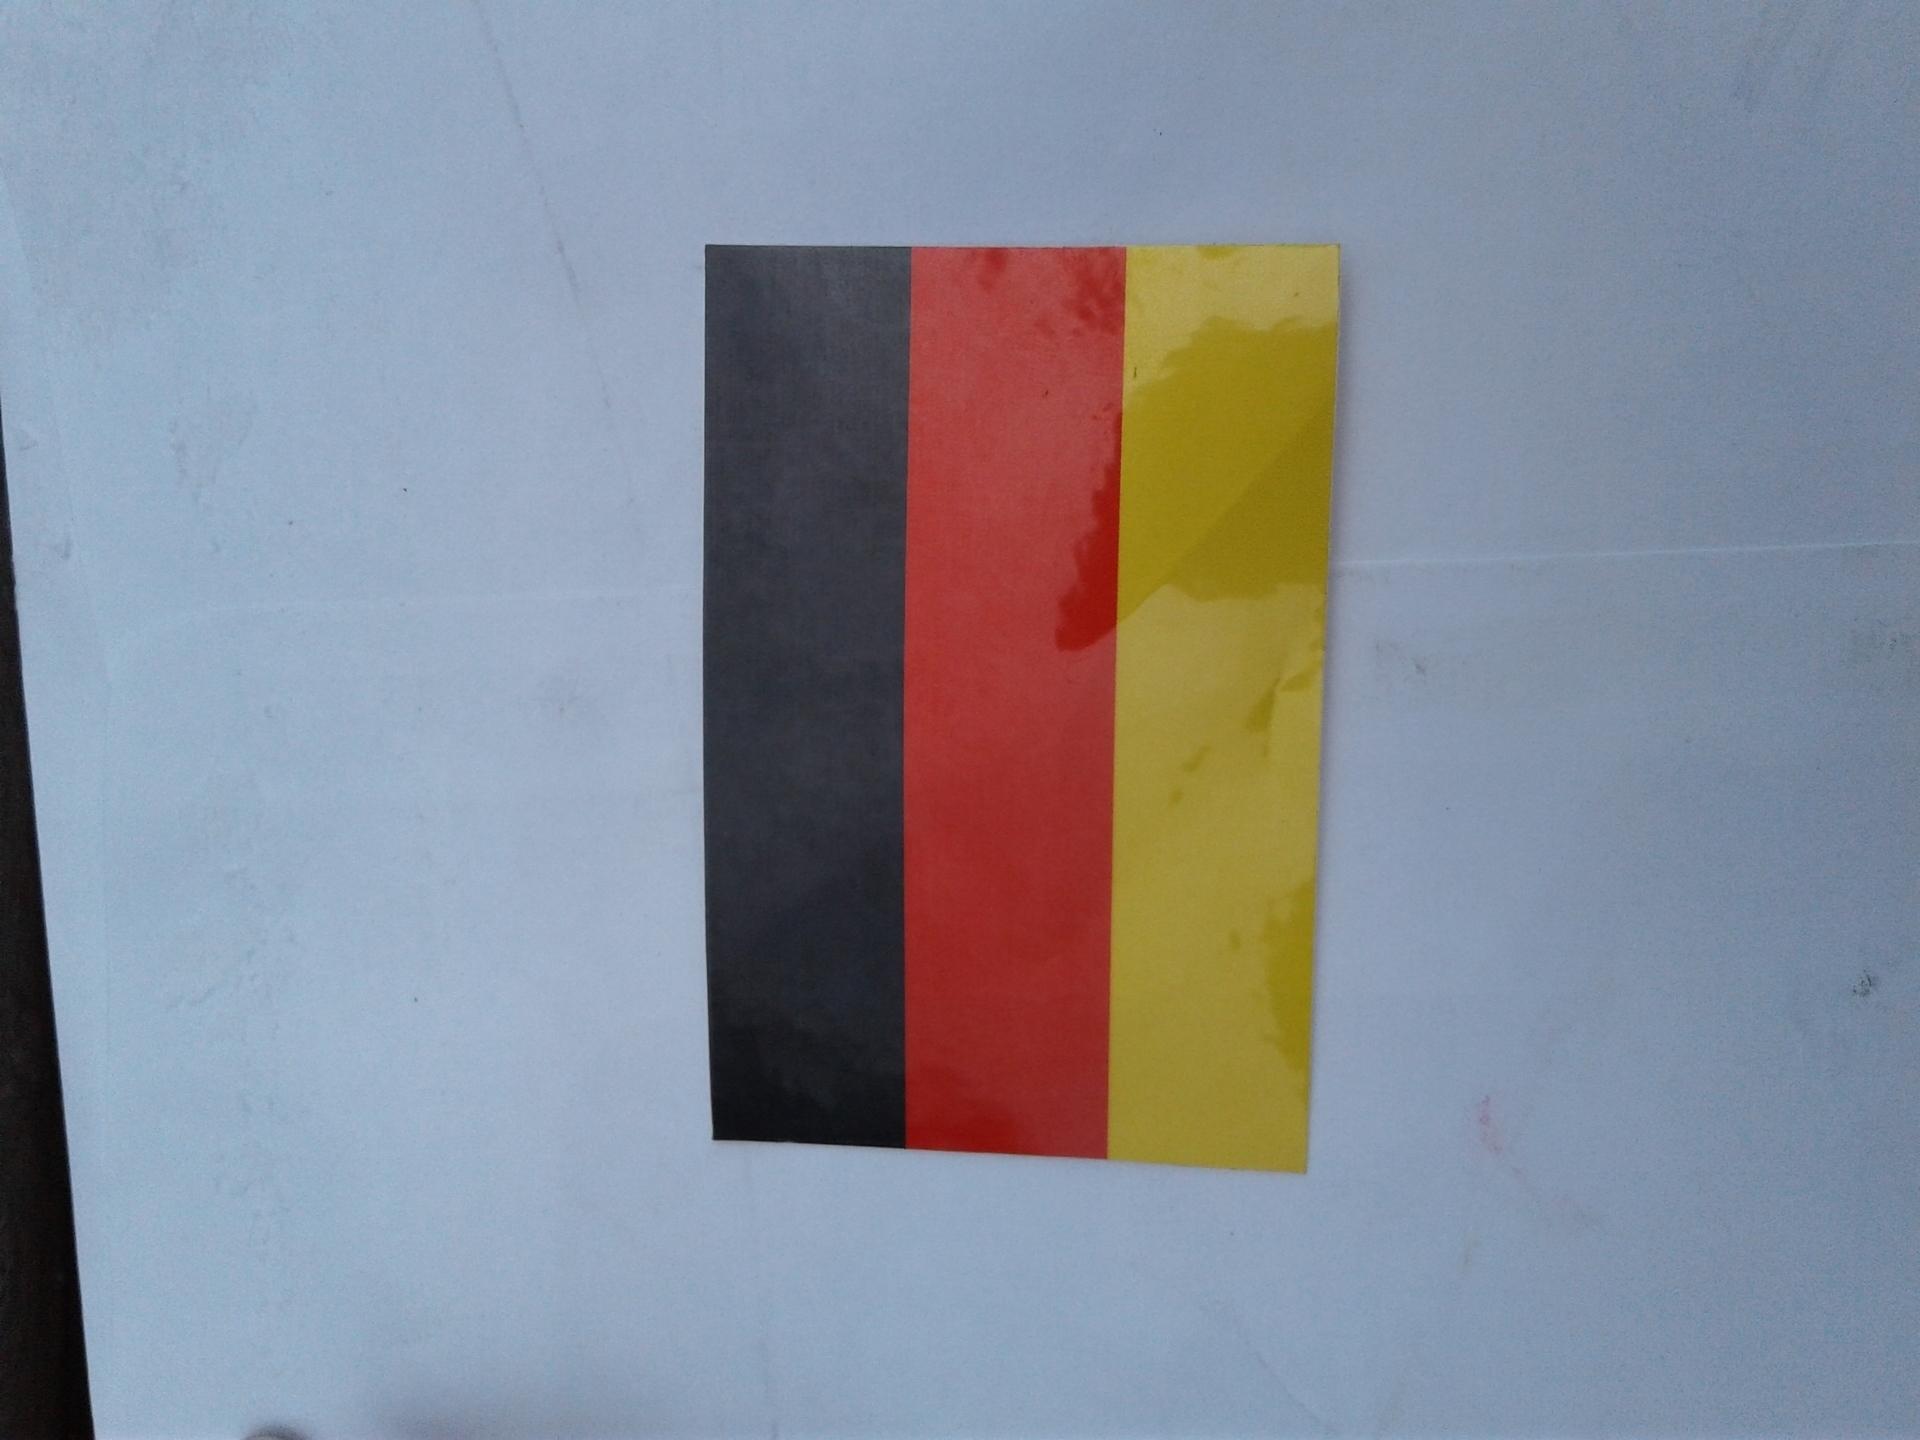 Birgit's photograph of their Germany Flag Sticker